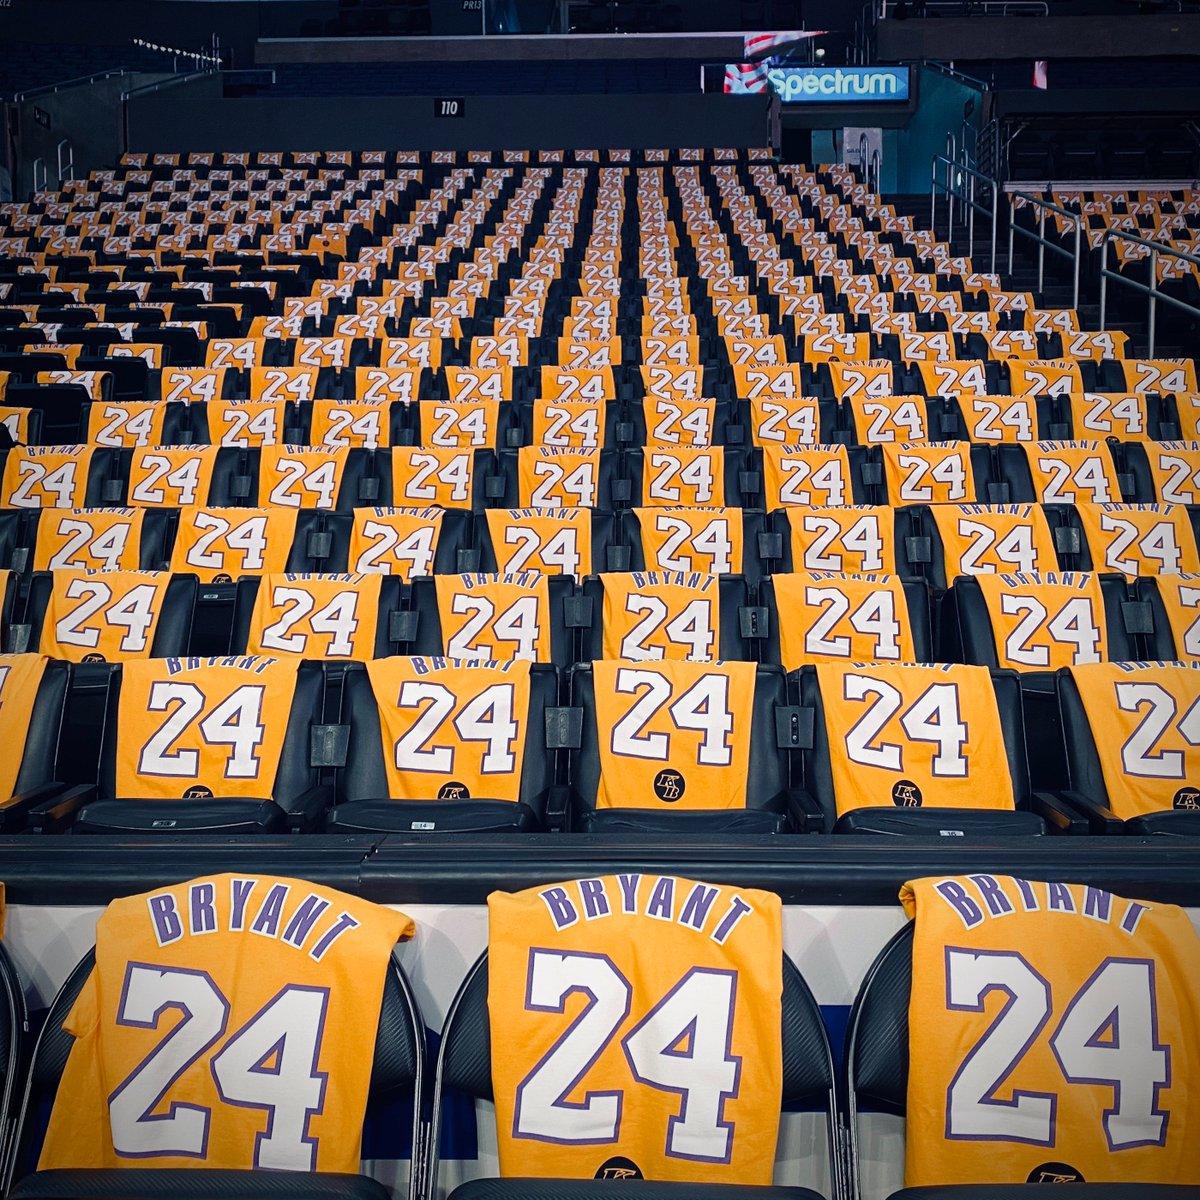 Staples Center tonight 🙏